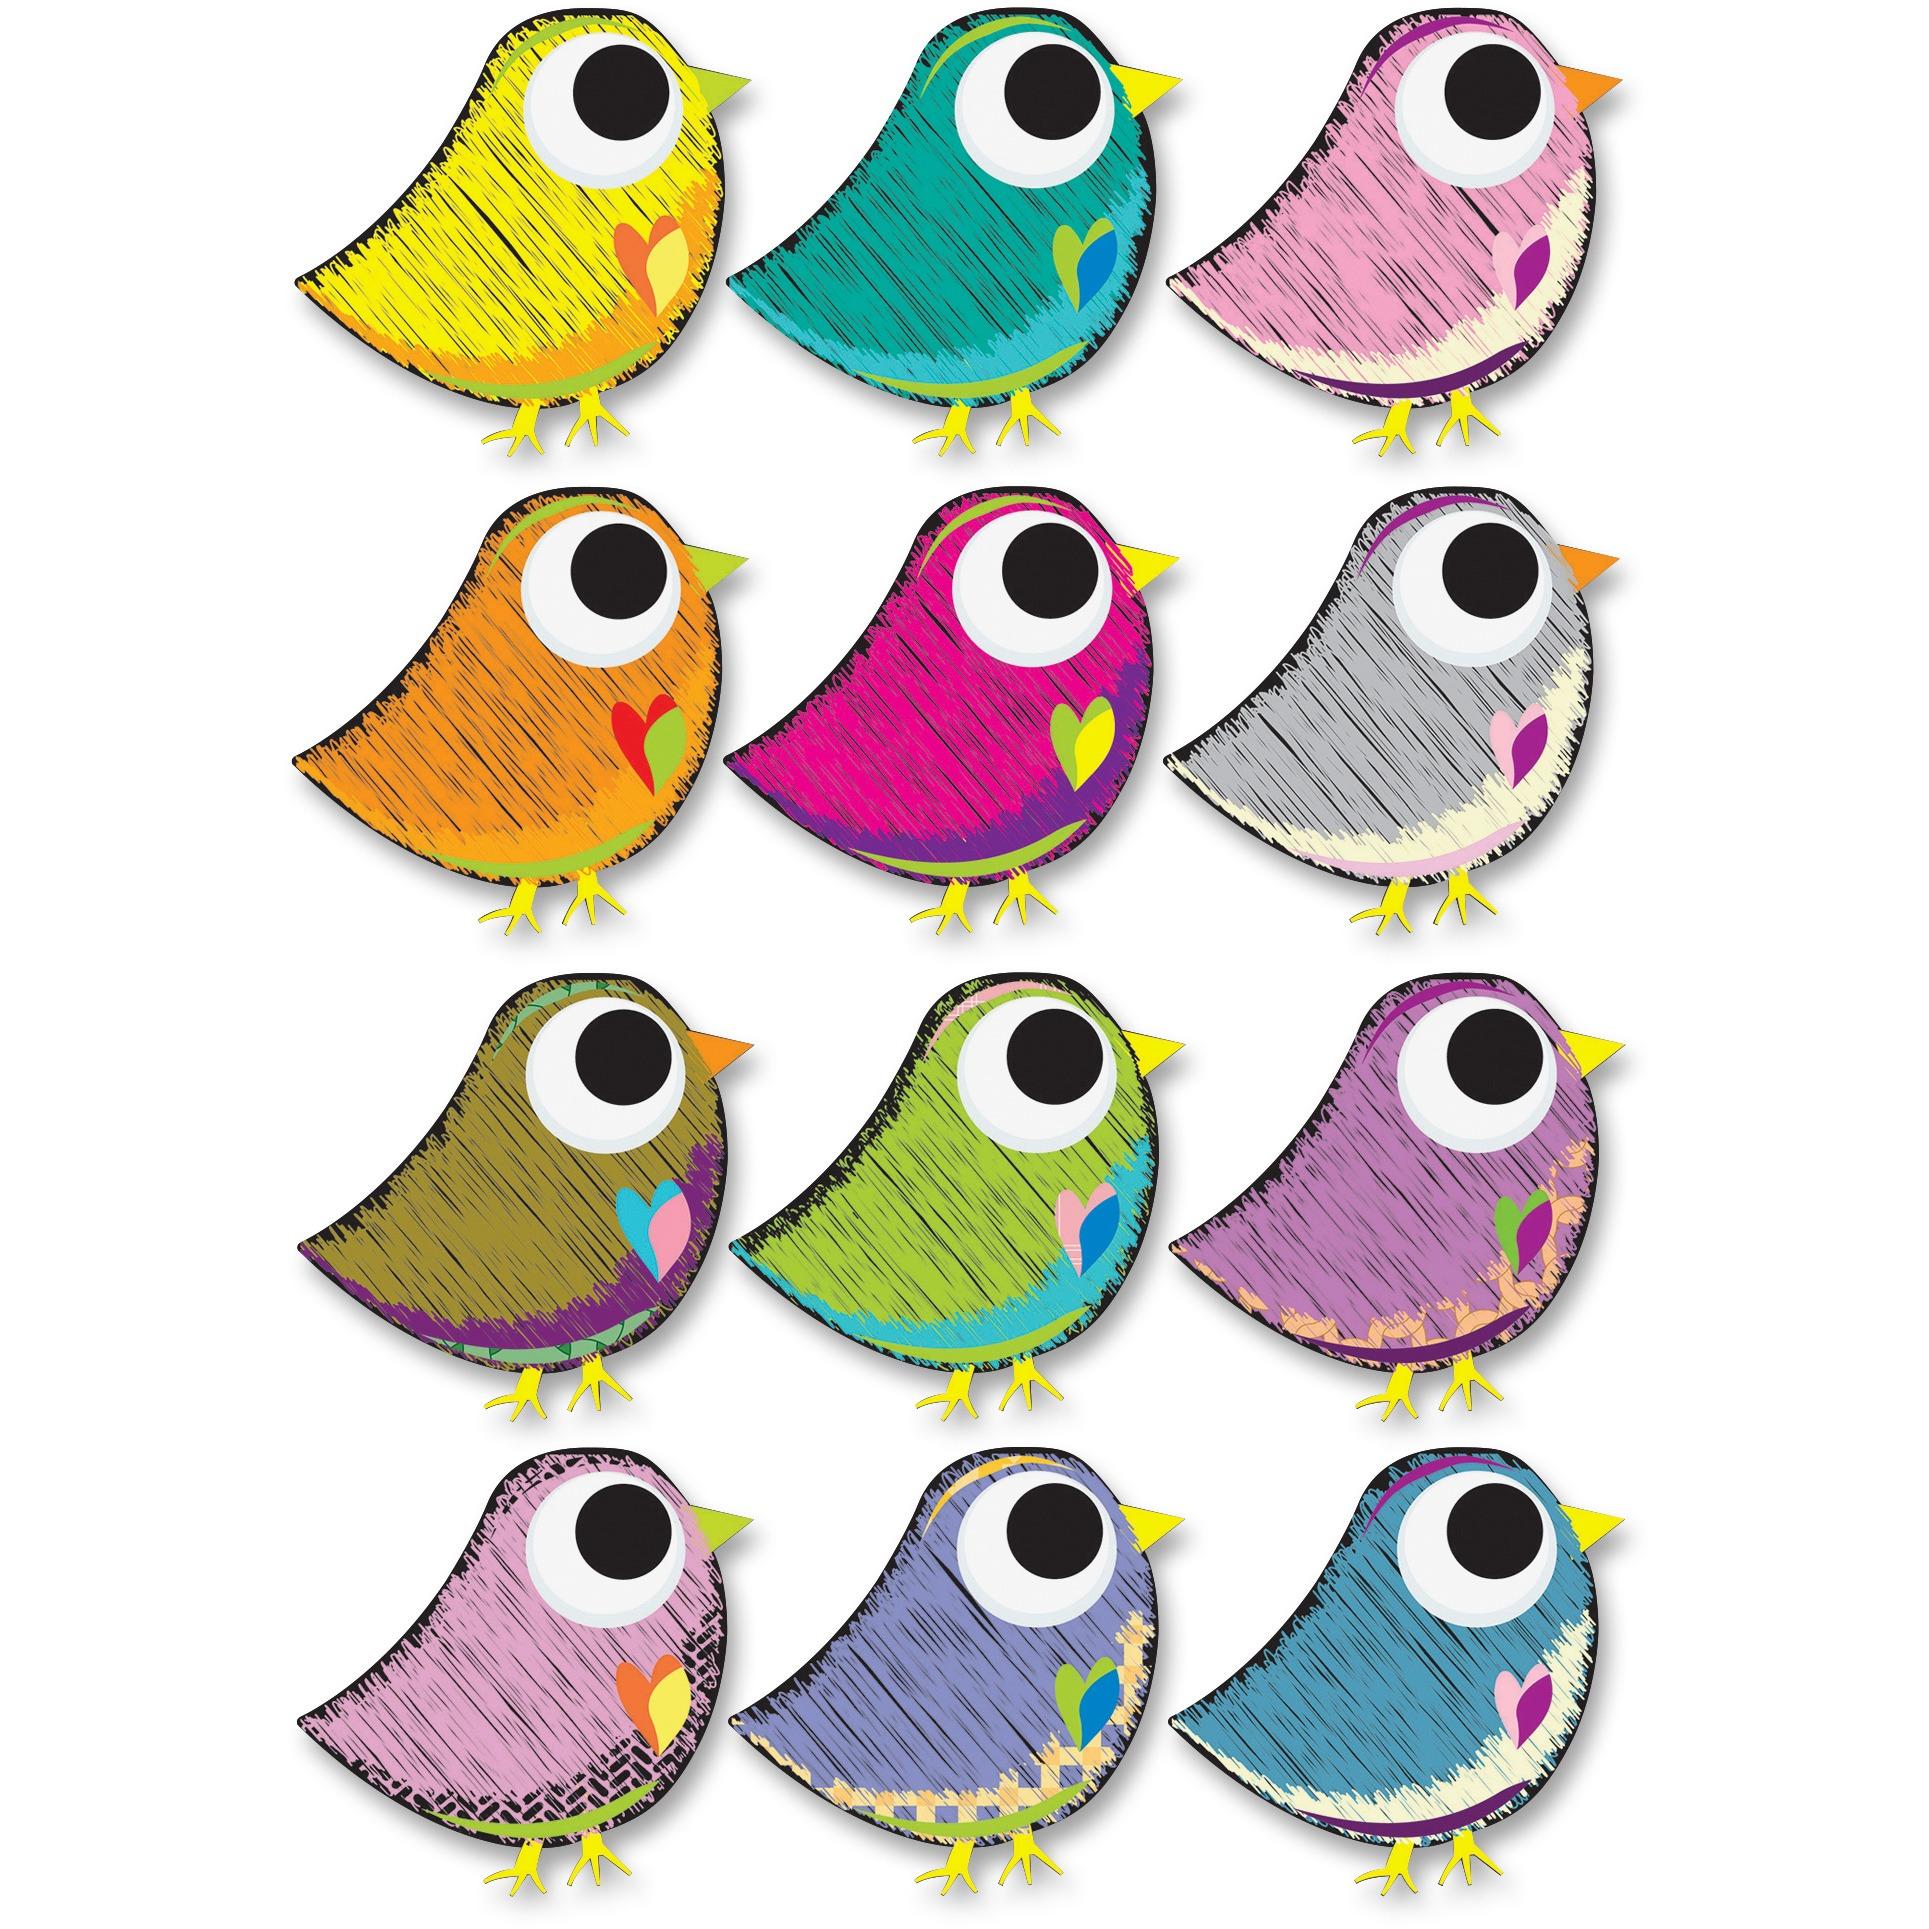 Ashley, ASH10084, Scribble Bird Design Dry Erase Magnet, 1 Set, Multicolor